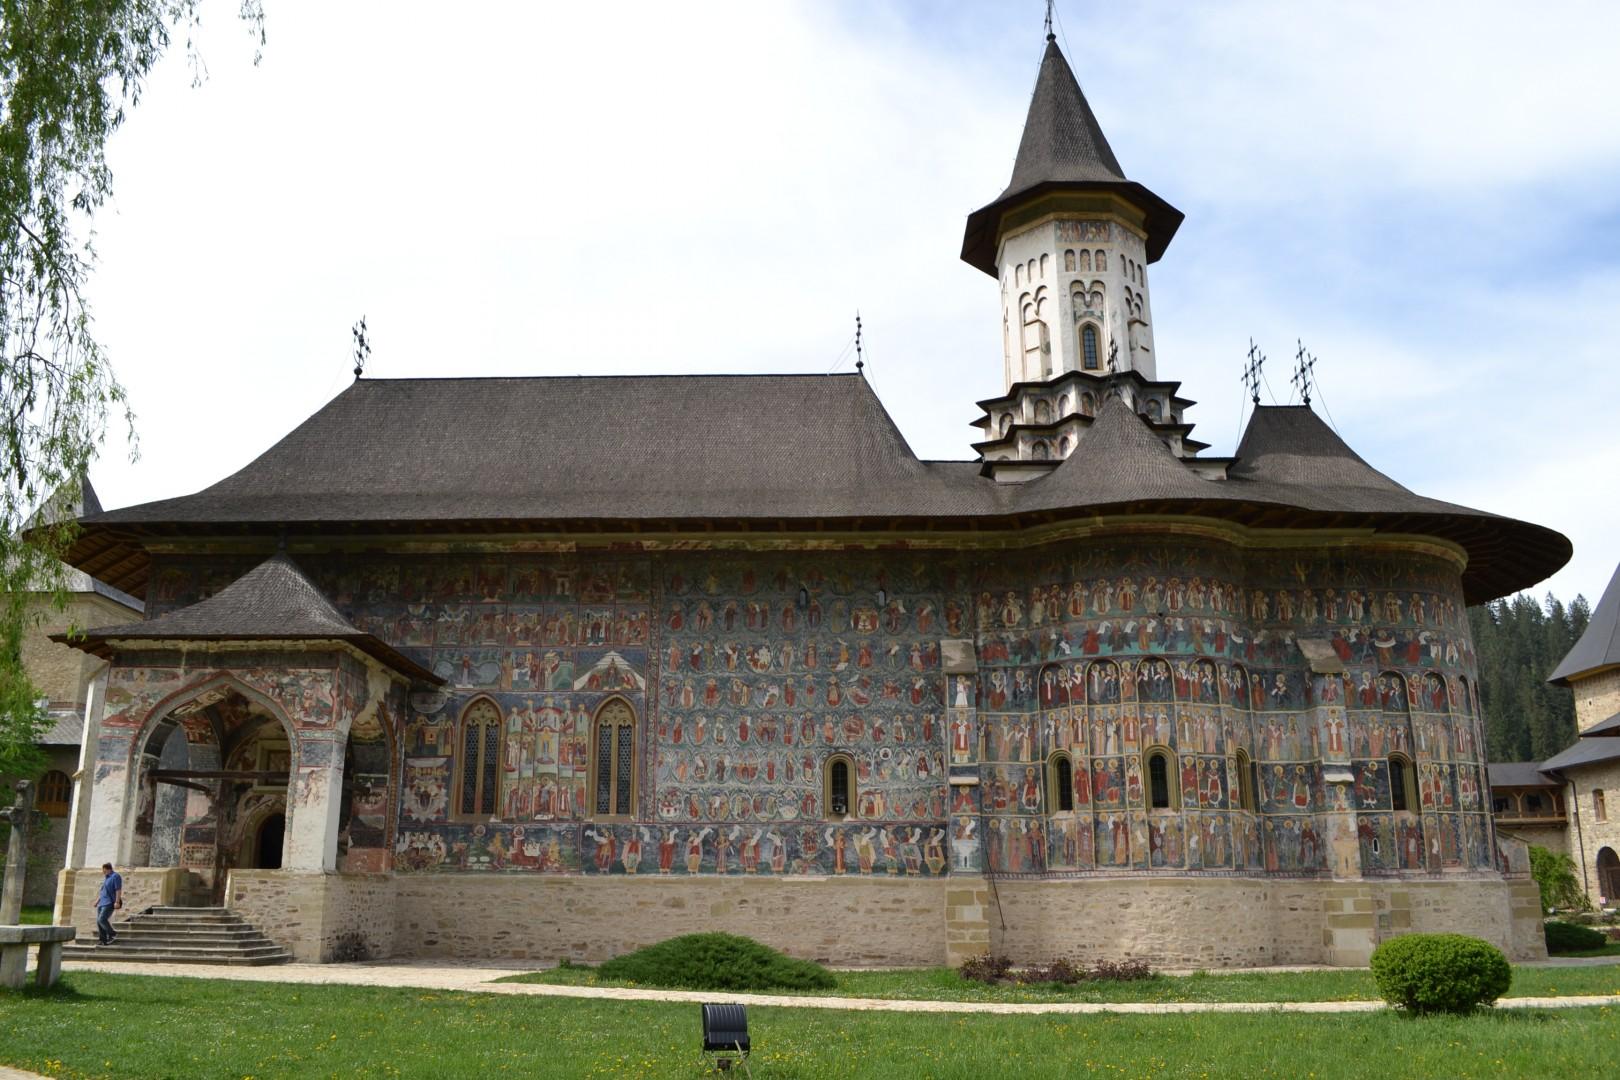 22 - 24 iulie 2019  22 – 24 IULIE 2019(luni – miercuri), Pelerinaj la Mănăstirile din MOLDOVA,